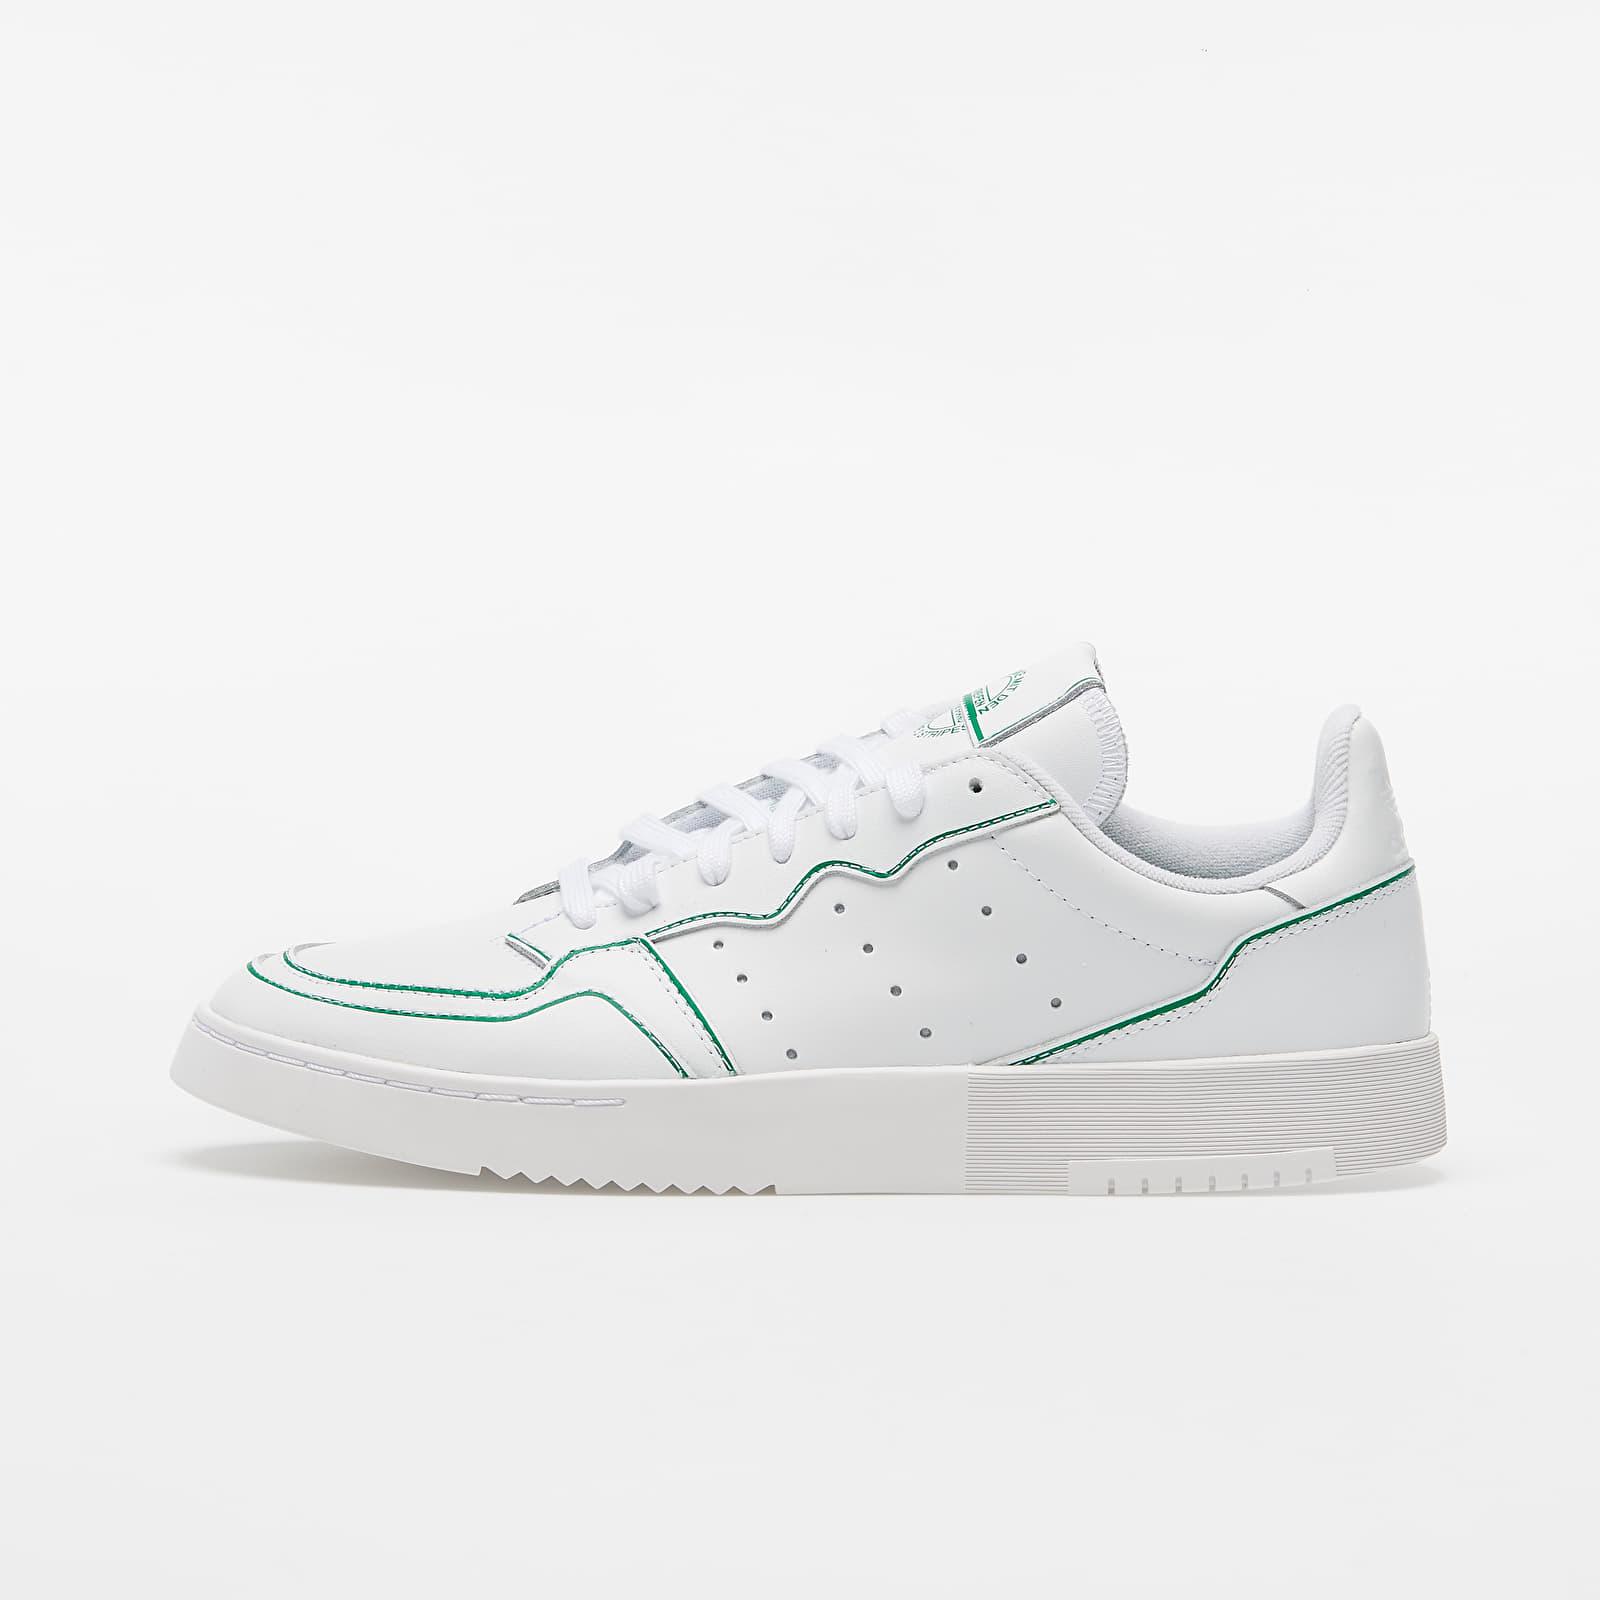 adidas Supercourt Ftw White/ Ftw White/ Green FX9059